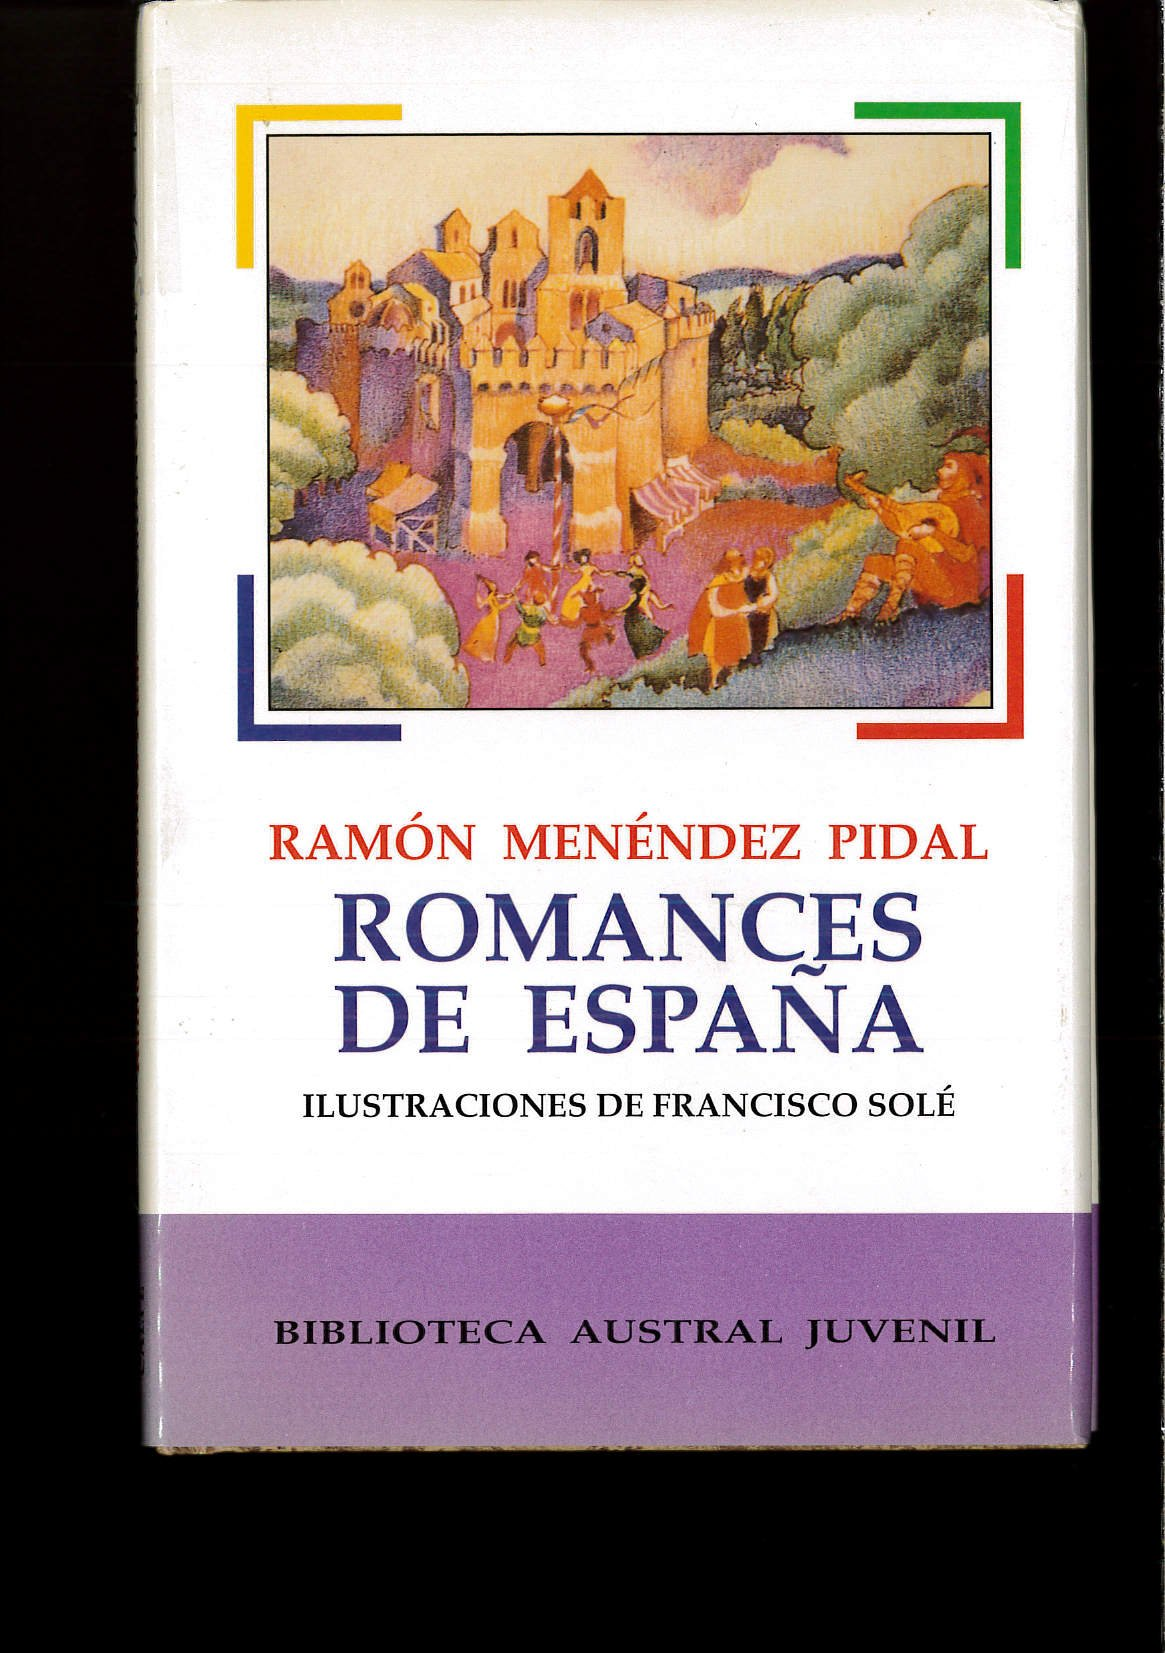 Romances de España: Amazon.es: MENENDEZ PIDAL, RAMON (ILUSTRACIONES DE FRANCISCO SOLE), MENENDEZ PIDAL, RAMON (ILUSTRACIONES DE FRANCISCO SOLE), MENENDEZ PIDAL, RAMON (ILUSTRACIONES DE FRANCISCO SOLE): Libros